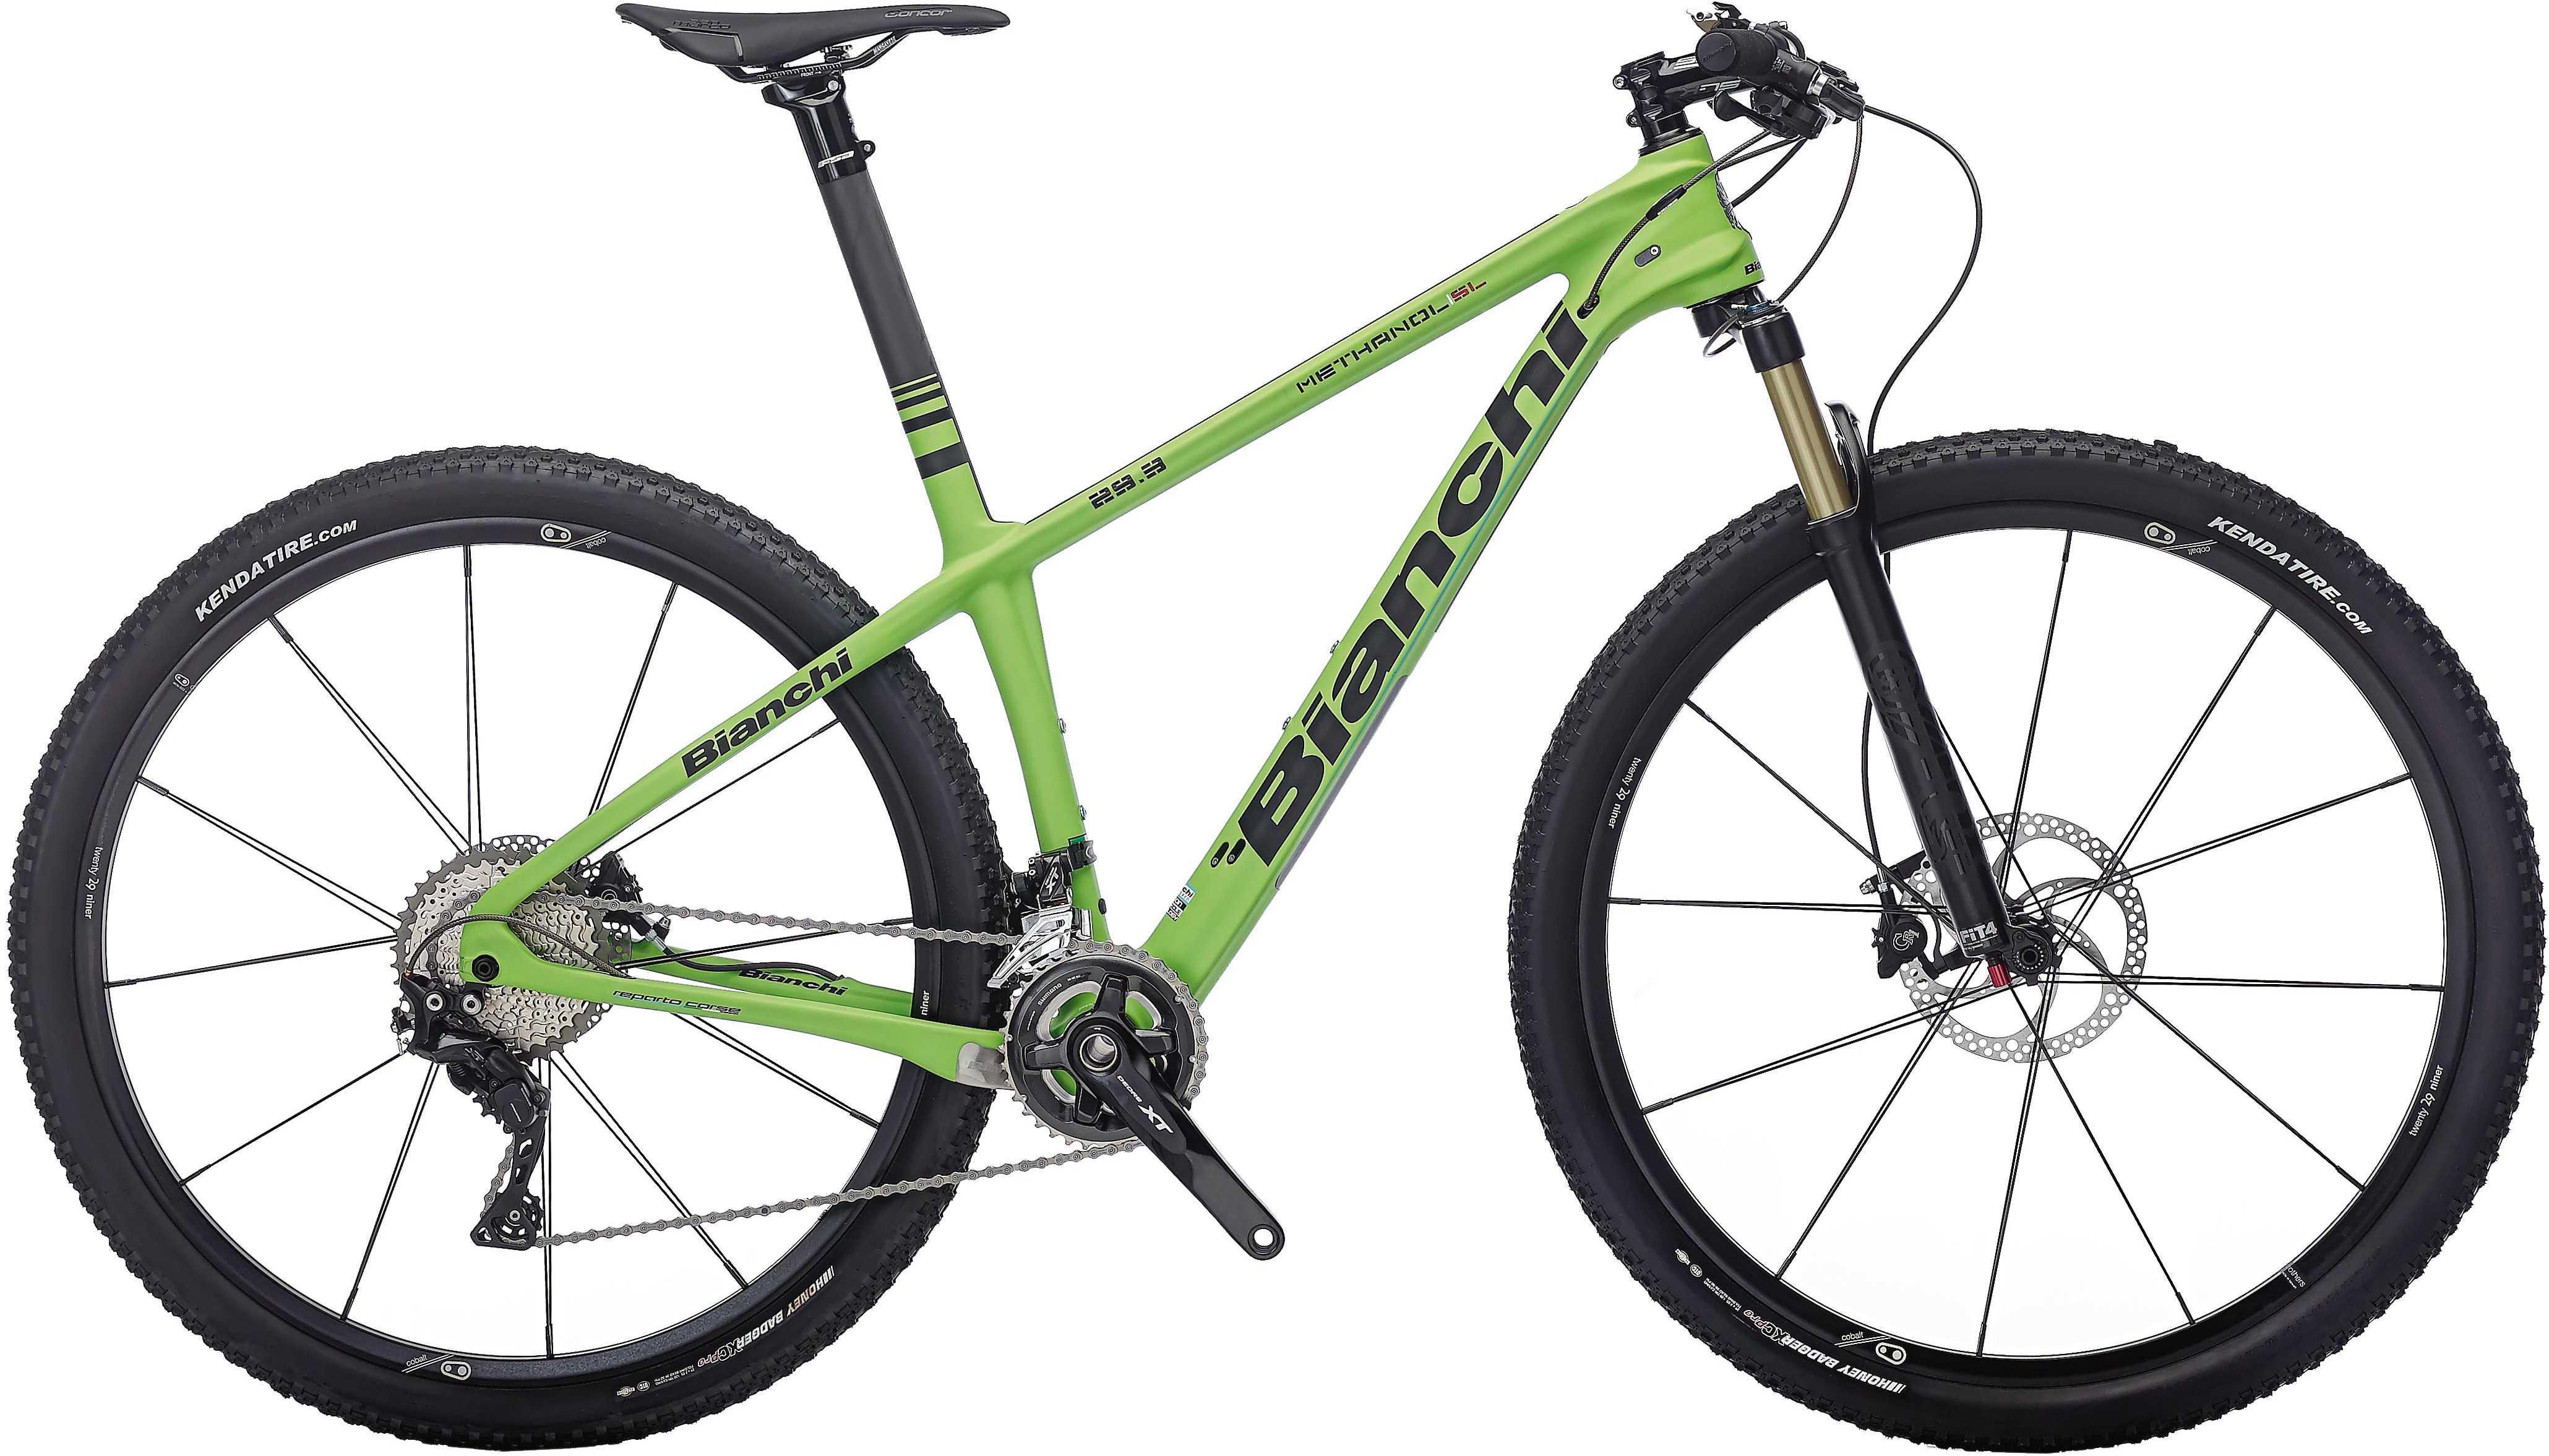 Bianchi Methanol 29.3 SL grön/svart 43 cm